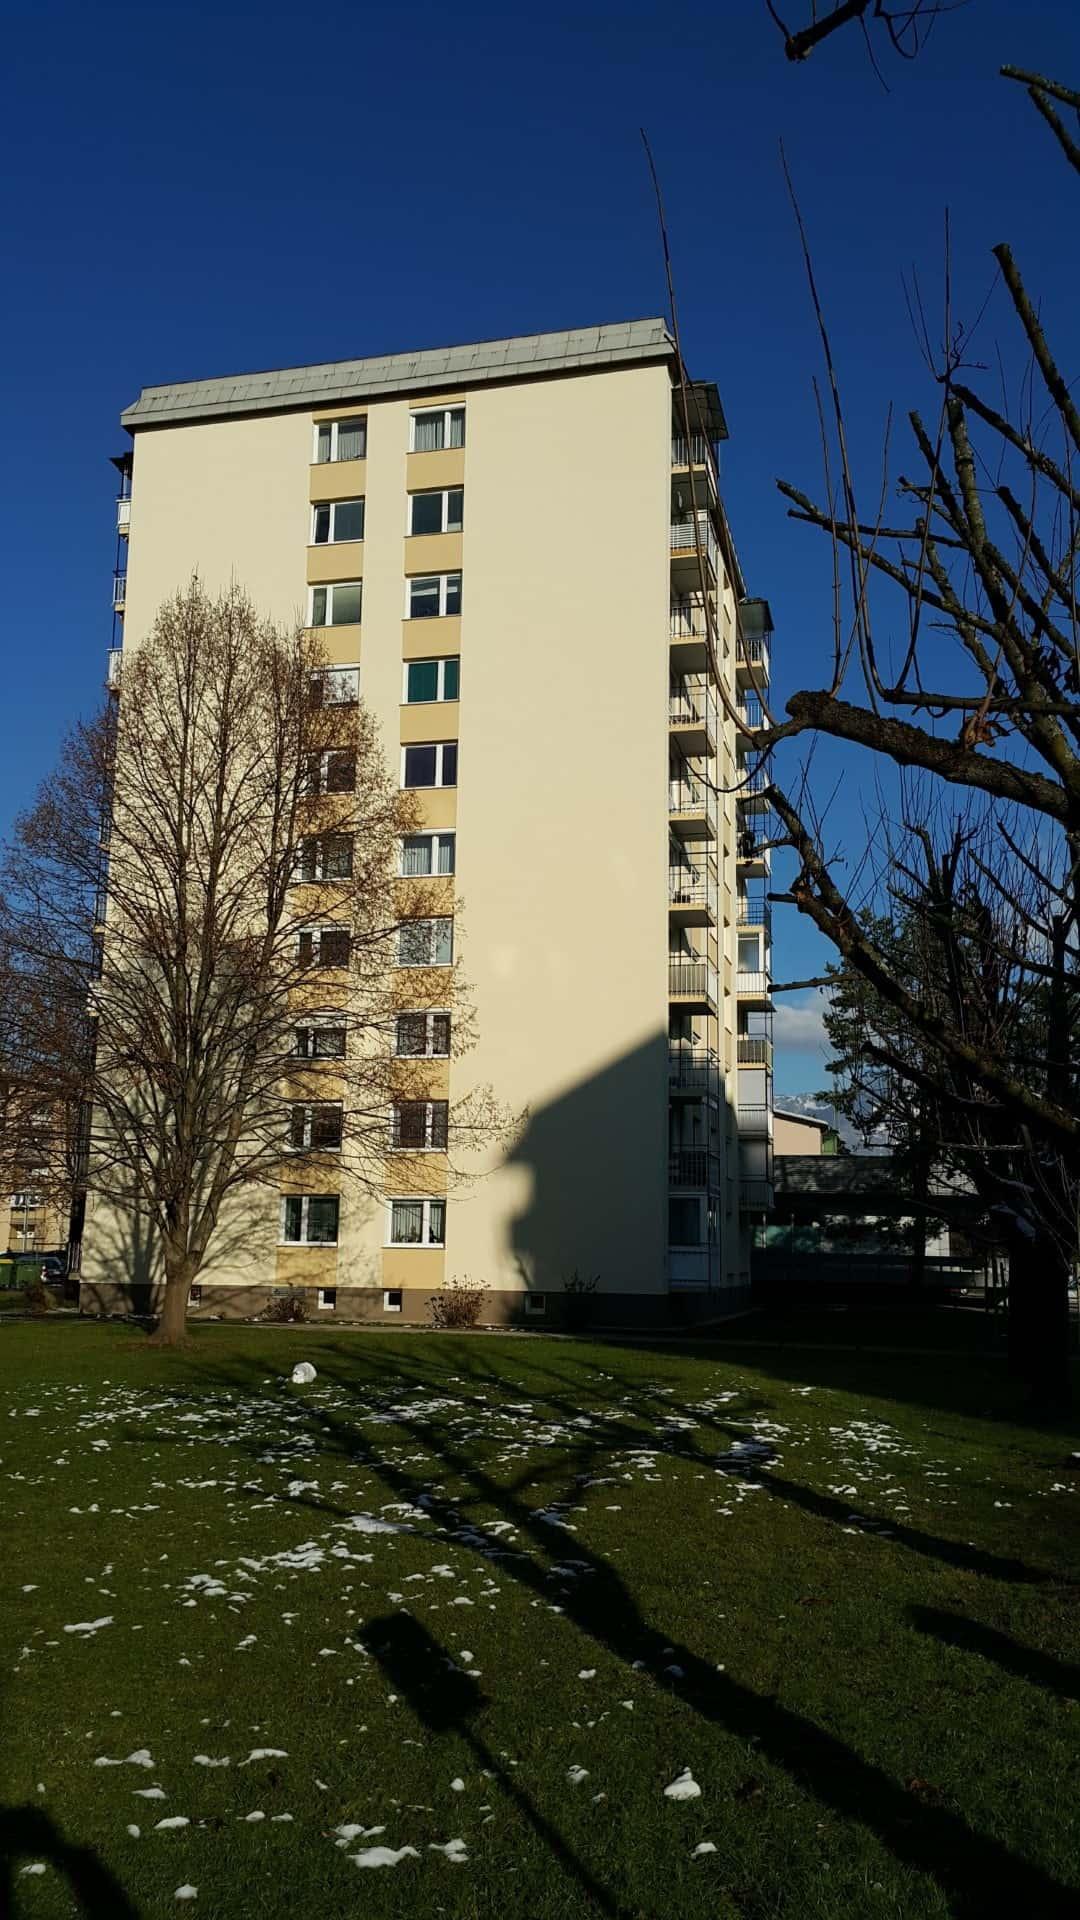 Permal doo reference Stolpnica kranj -1 2019 iMode d.o.o. (Large)